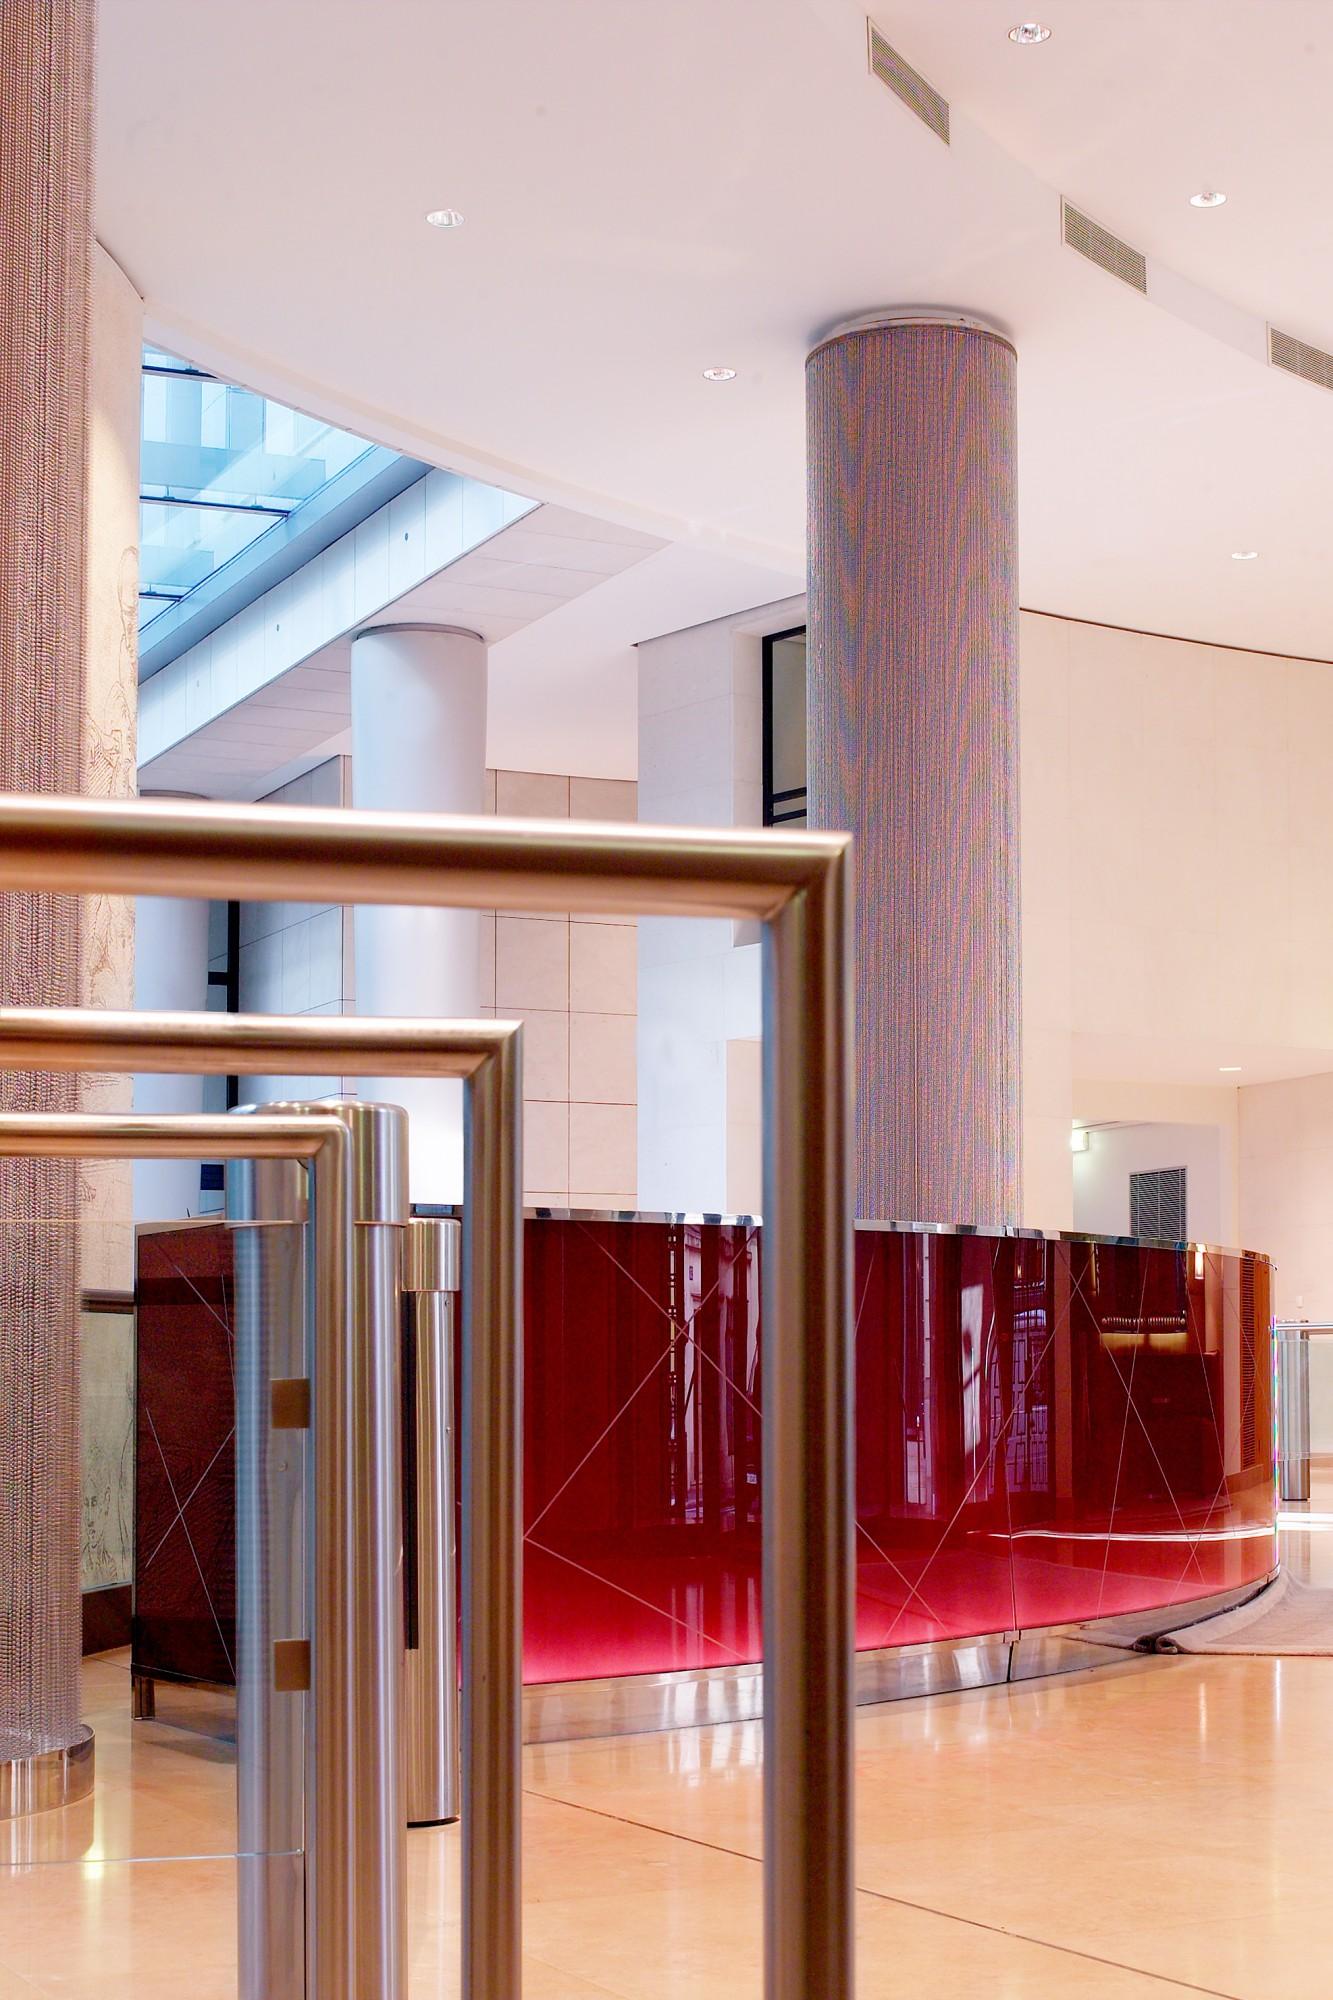 Business Center Paris Victoire-Asaa Architecture#02